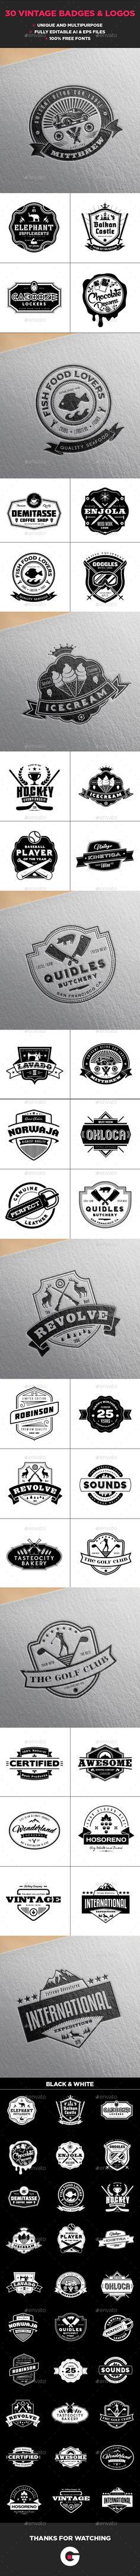 30 Vintage Logo Collection Volume 4 - Badges & Stickers Web Elements